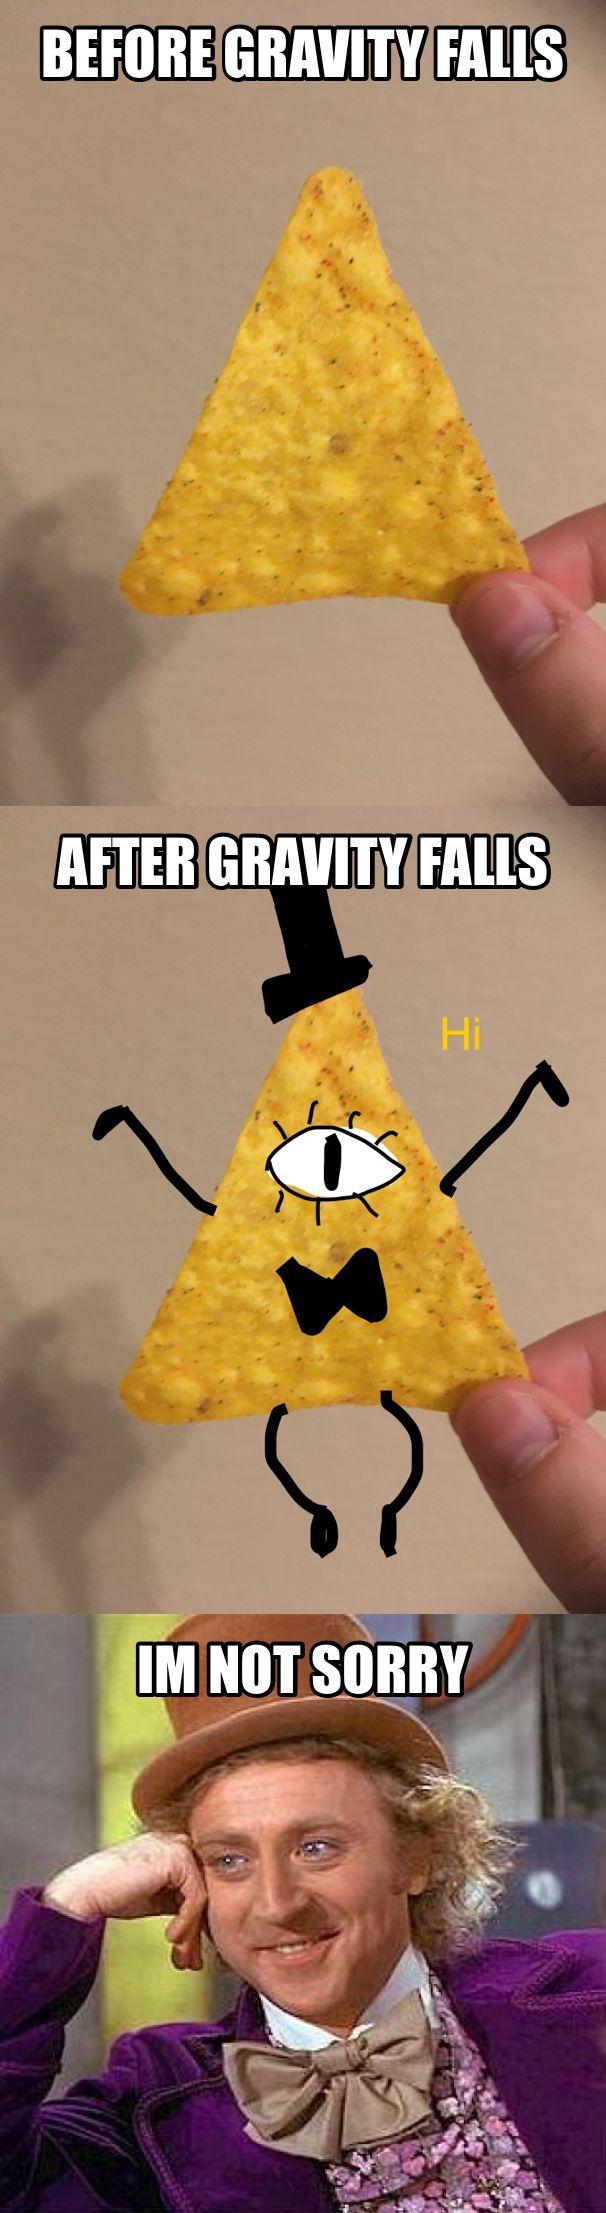 Gravity Falls has changed me Демотиваторы ...